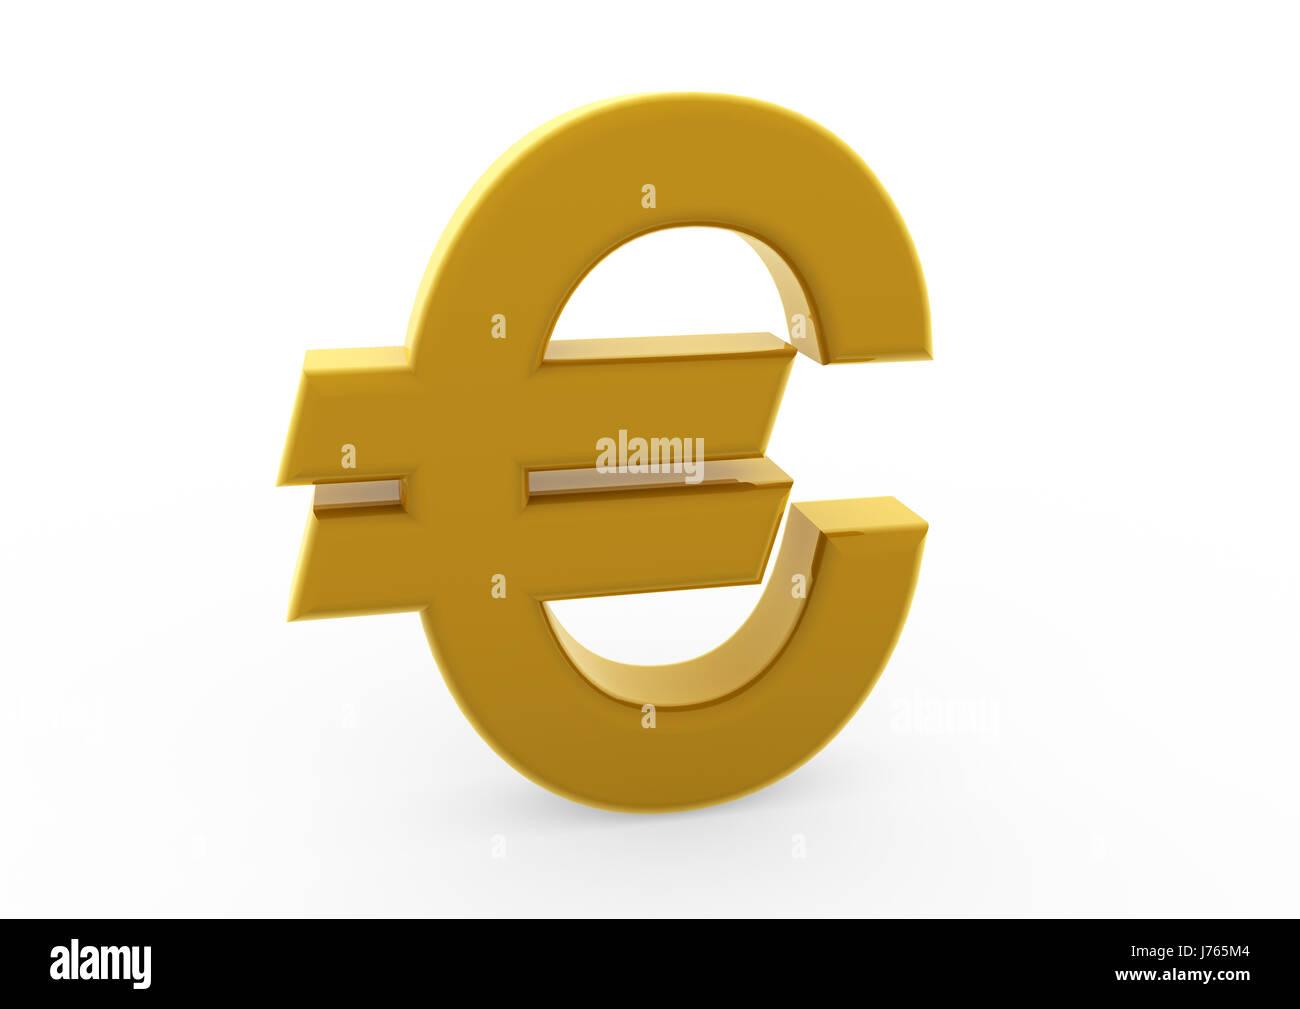 Gold trading symbol фунт стерлингов форекс